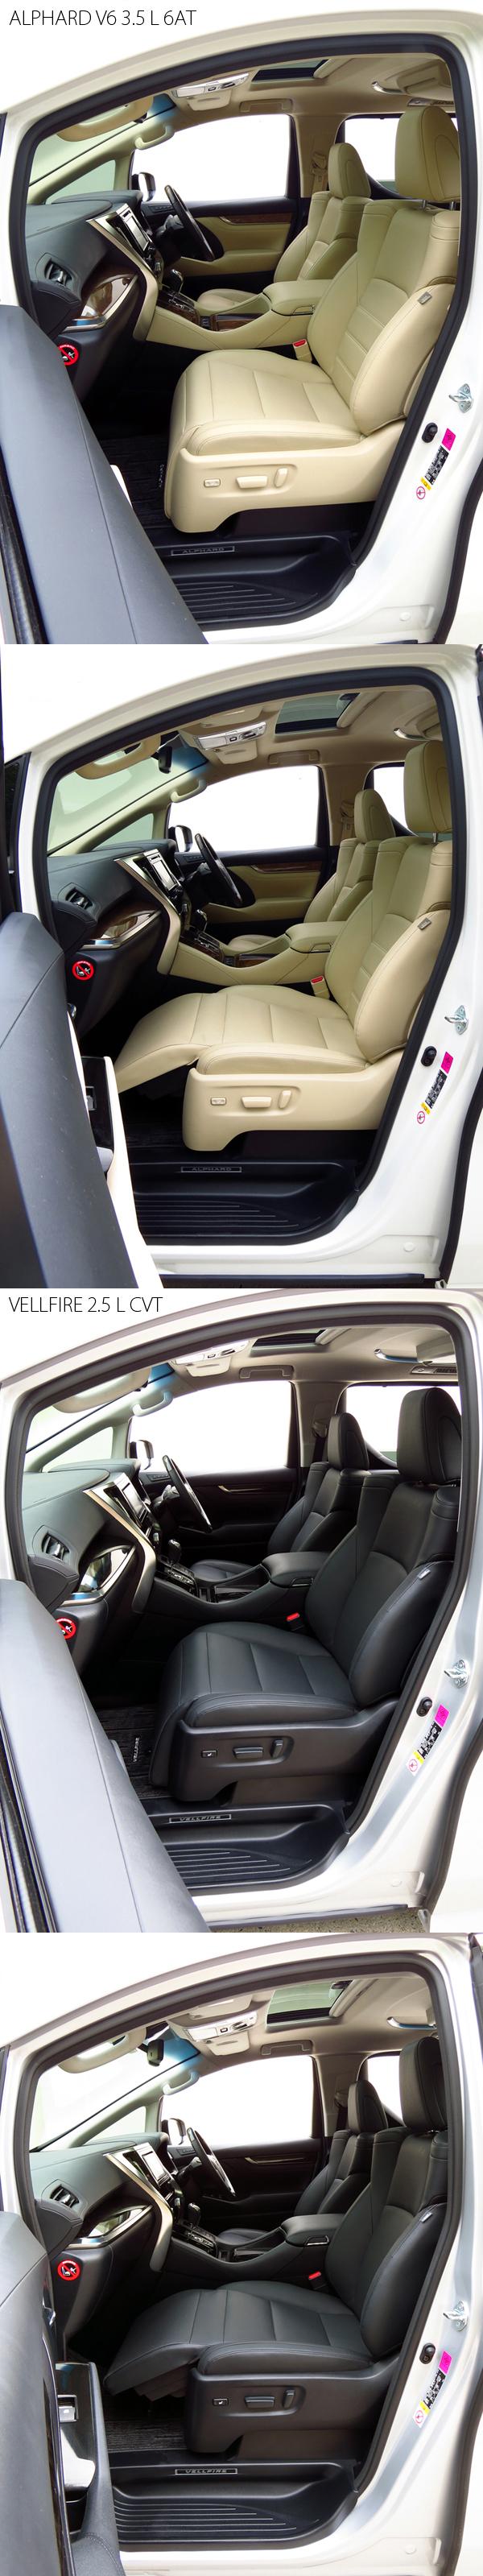 2015_07_Toyota_Alphard_Vellfire_Interior_03